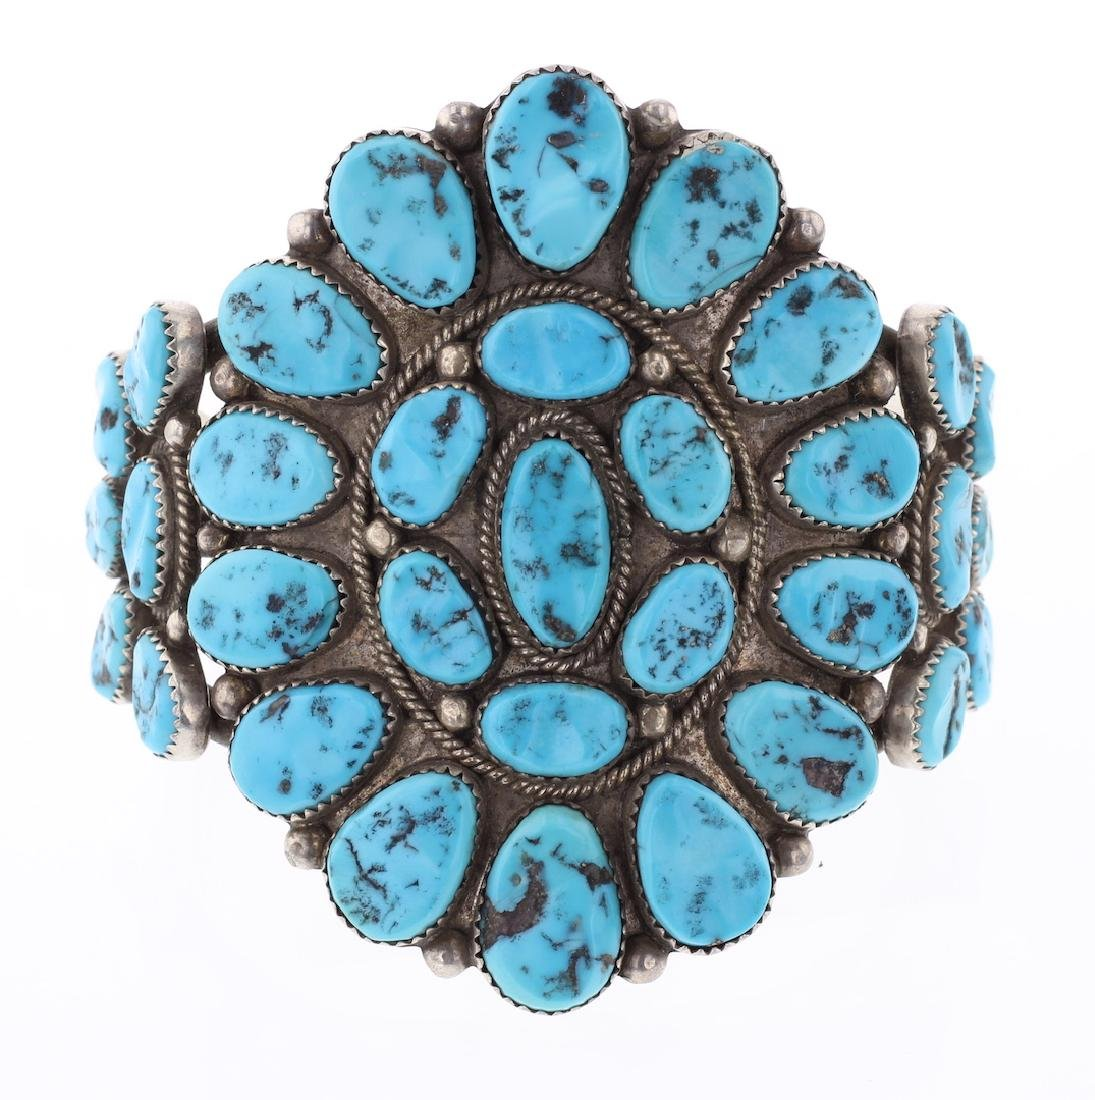 Sleeping Beauty Nugget Turquoise Cluster Bracelet